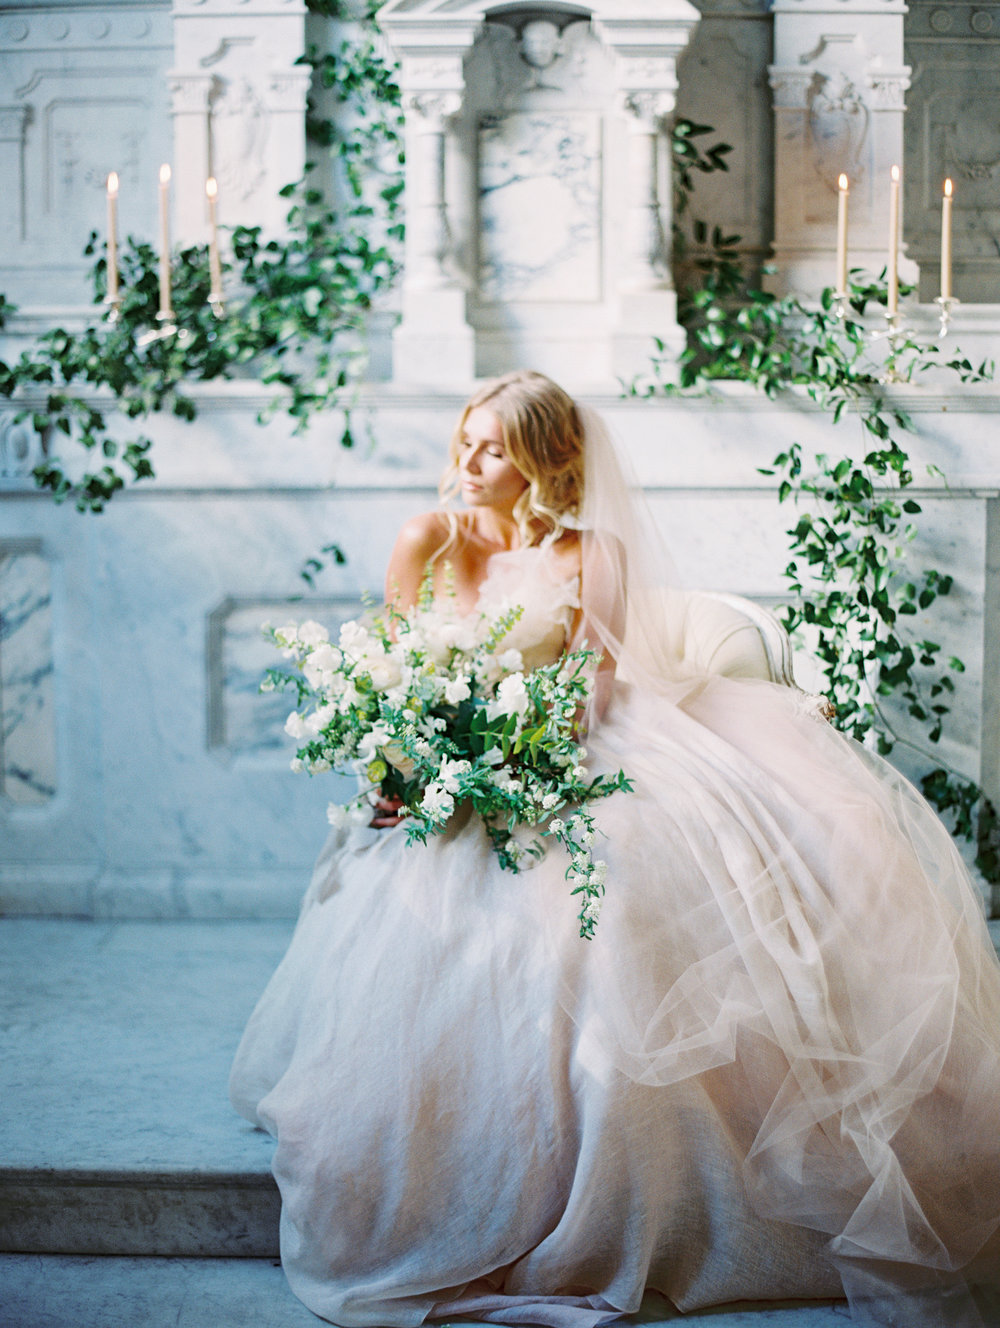 Carol Hannah Bridal Grand Palais Gown VibianabyValentinaGlidden_215.jpg